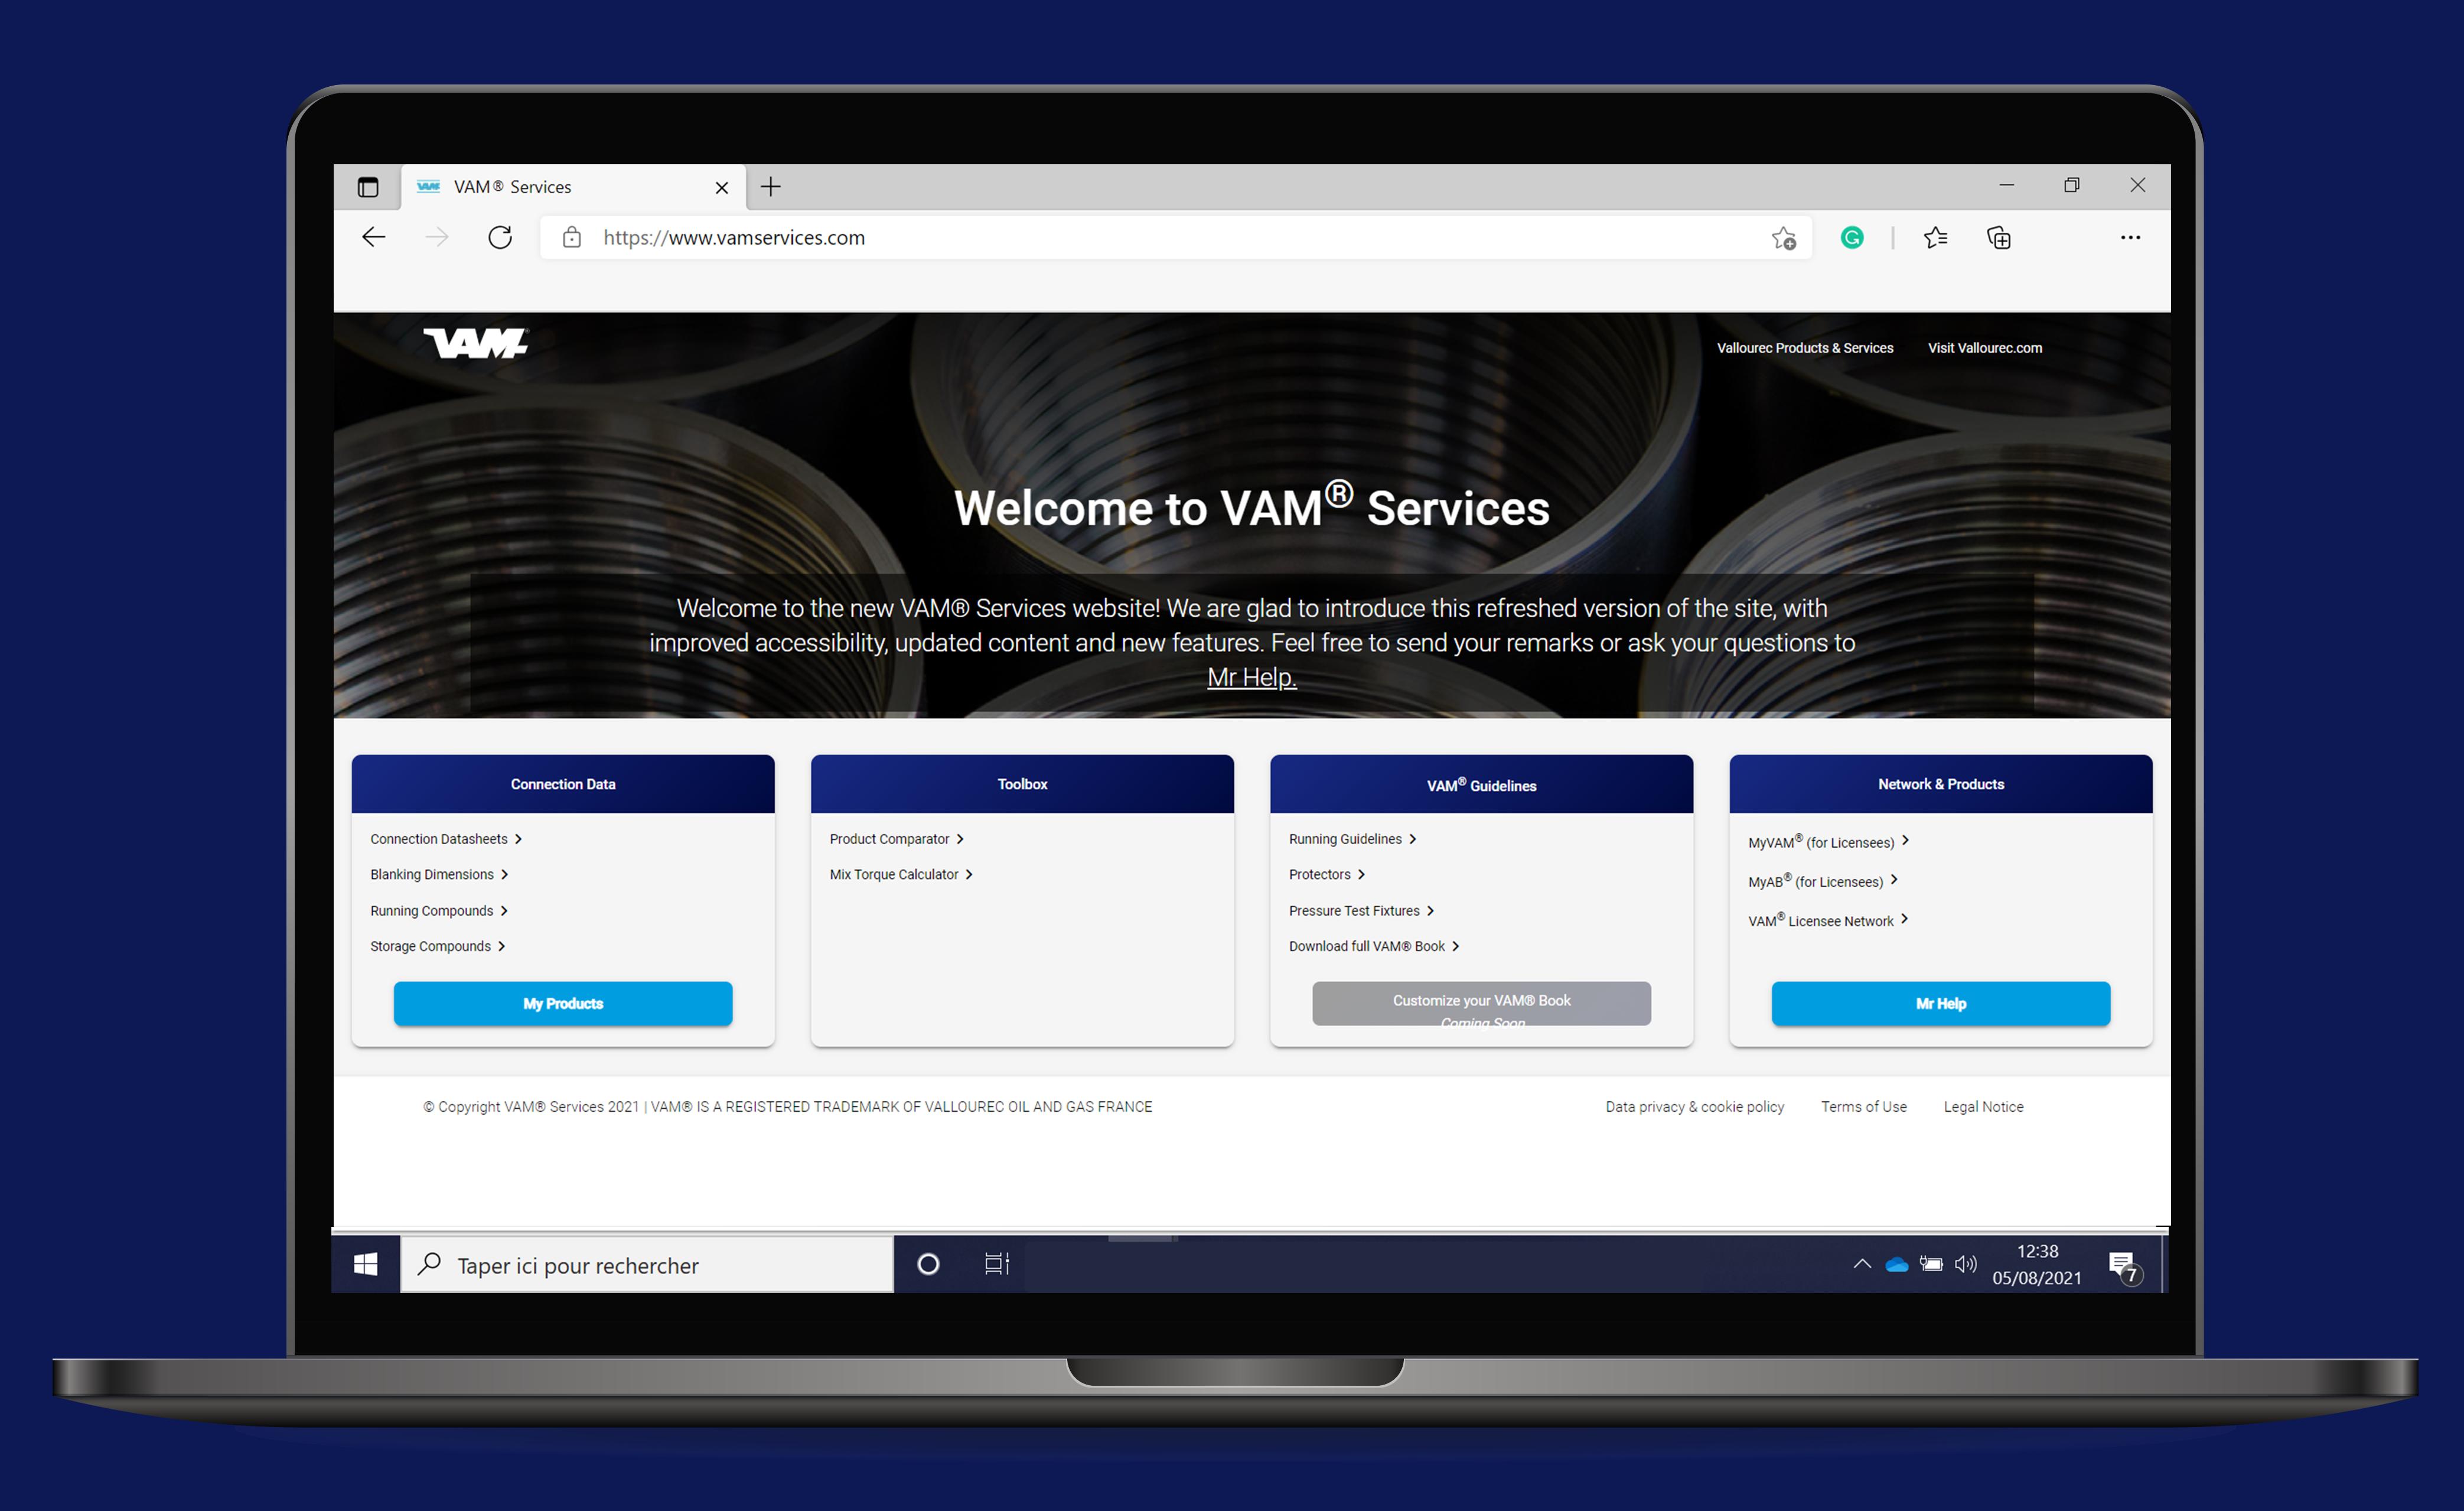 Screenshot of the new VAM website